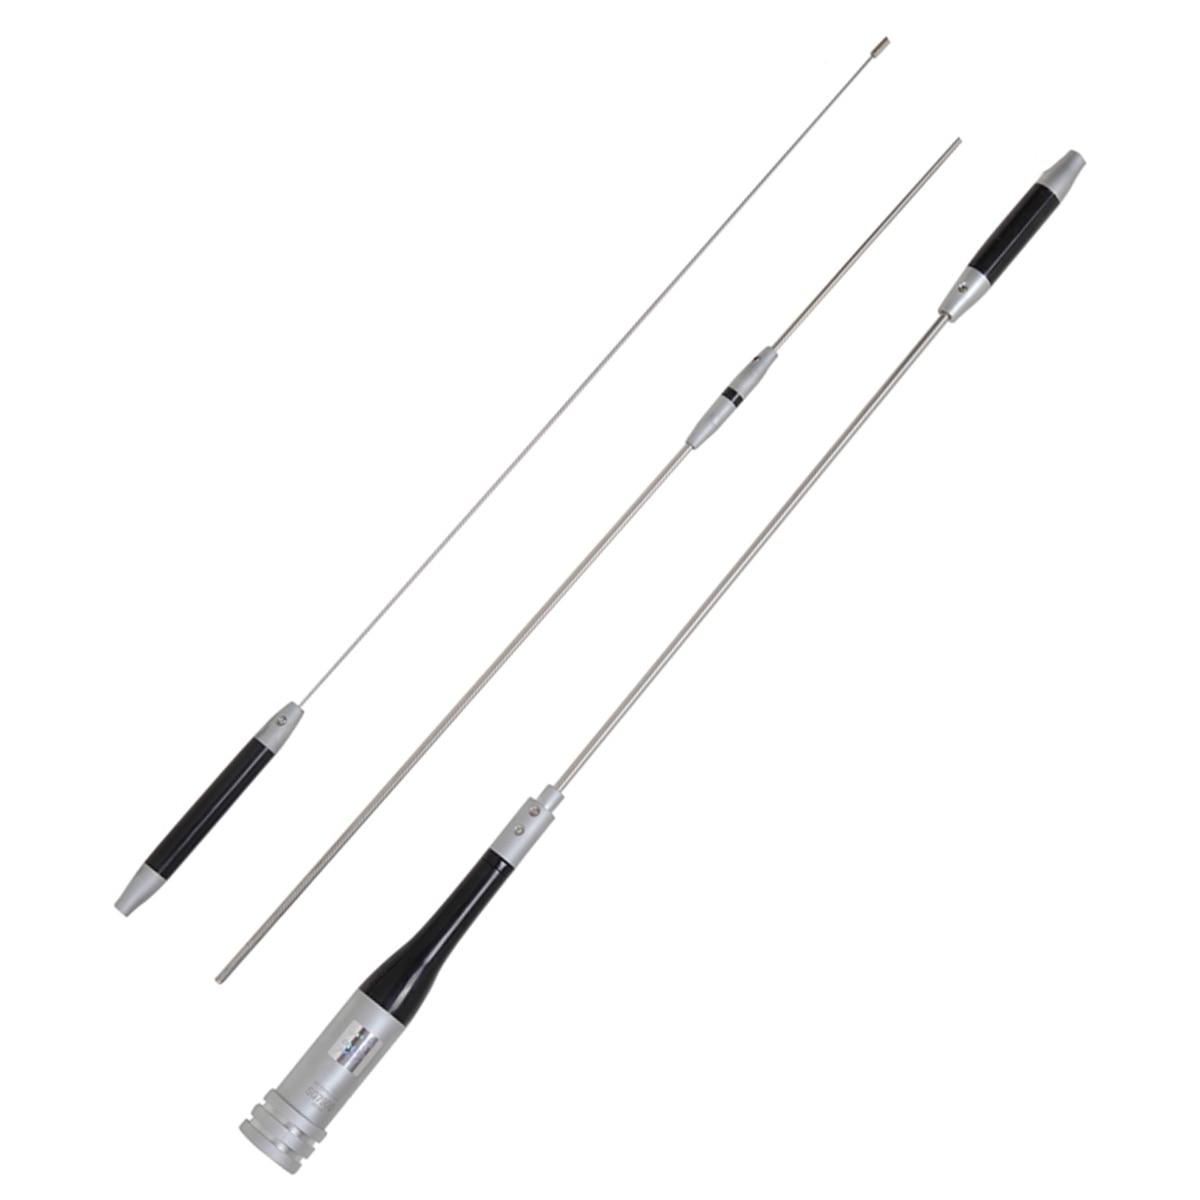 SOONUHA SG 7900 VHF UHF Dual Band Antenna 144MHz 430MHz Durable Stainless Steel 5.0dB 7.6dB High gain Antenna For Mobile Radio